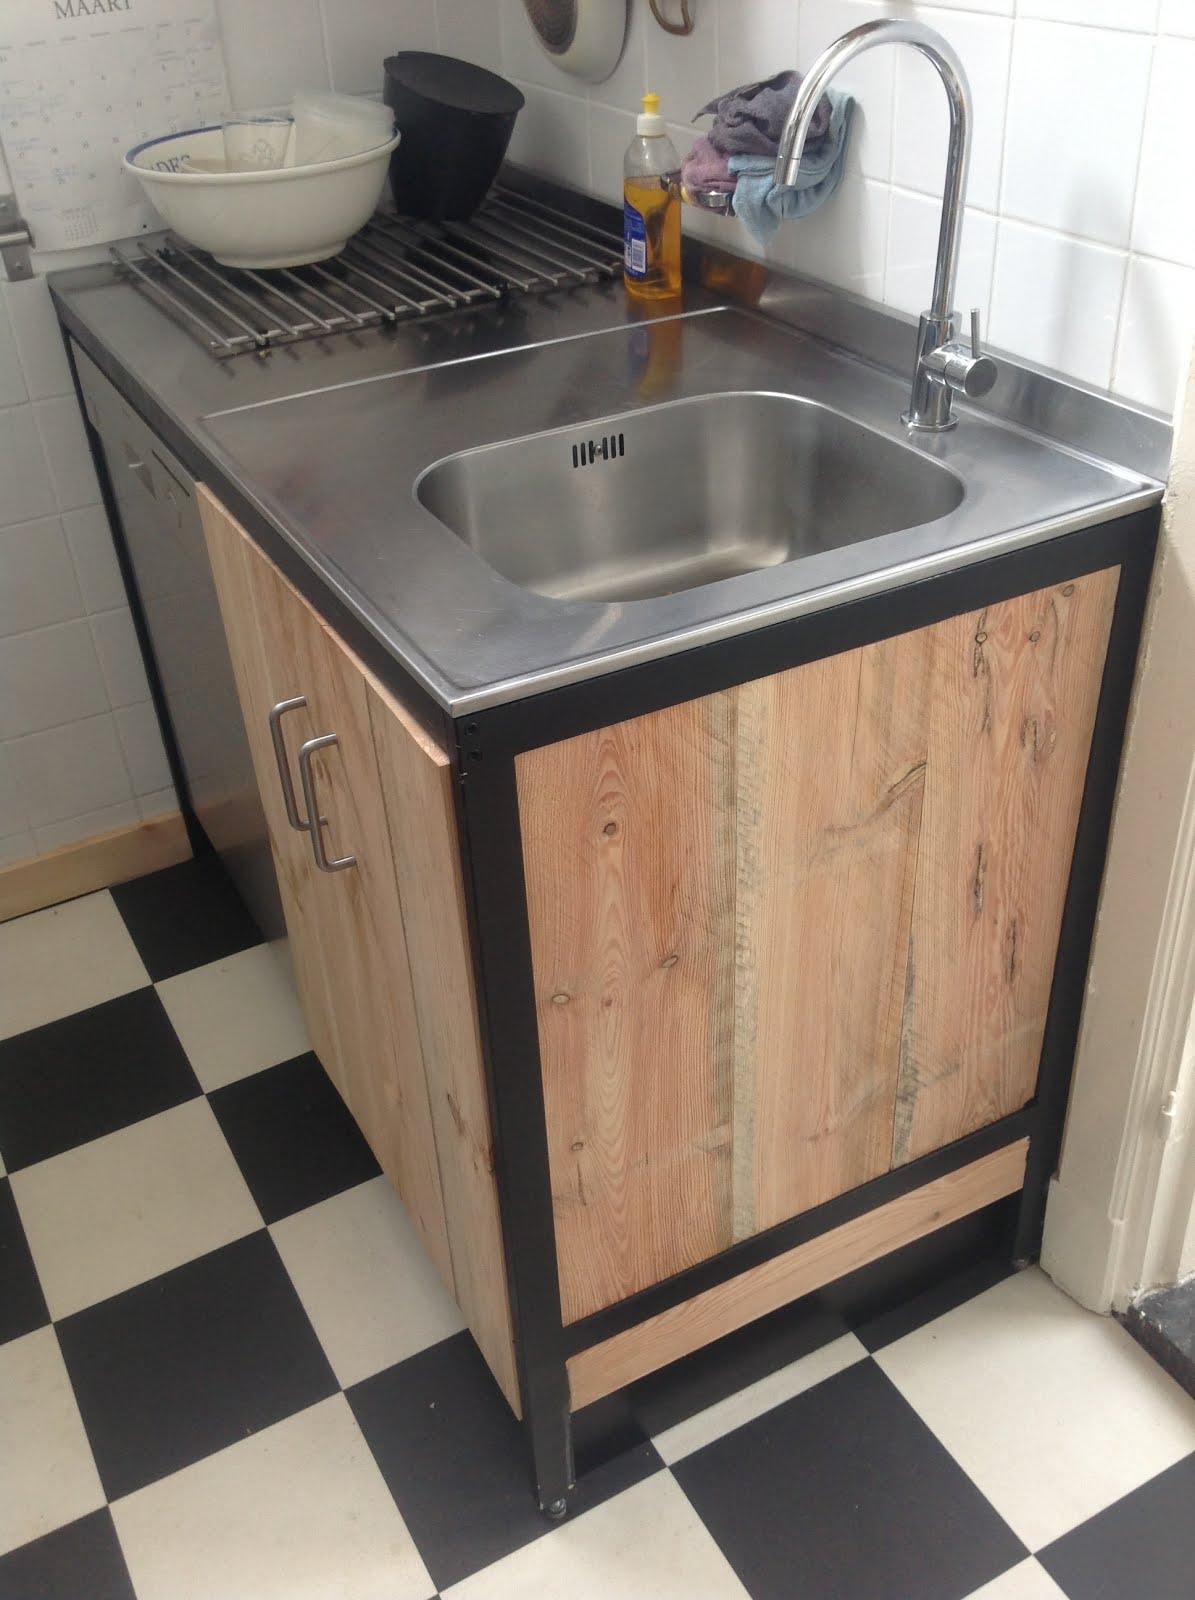 Hedendaags Hacked UDDEN kitchen - IKEA Hackers GB-82